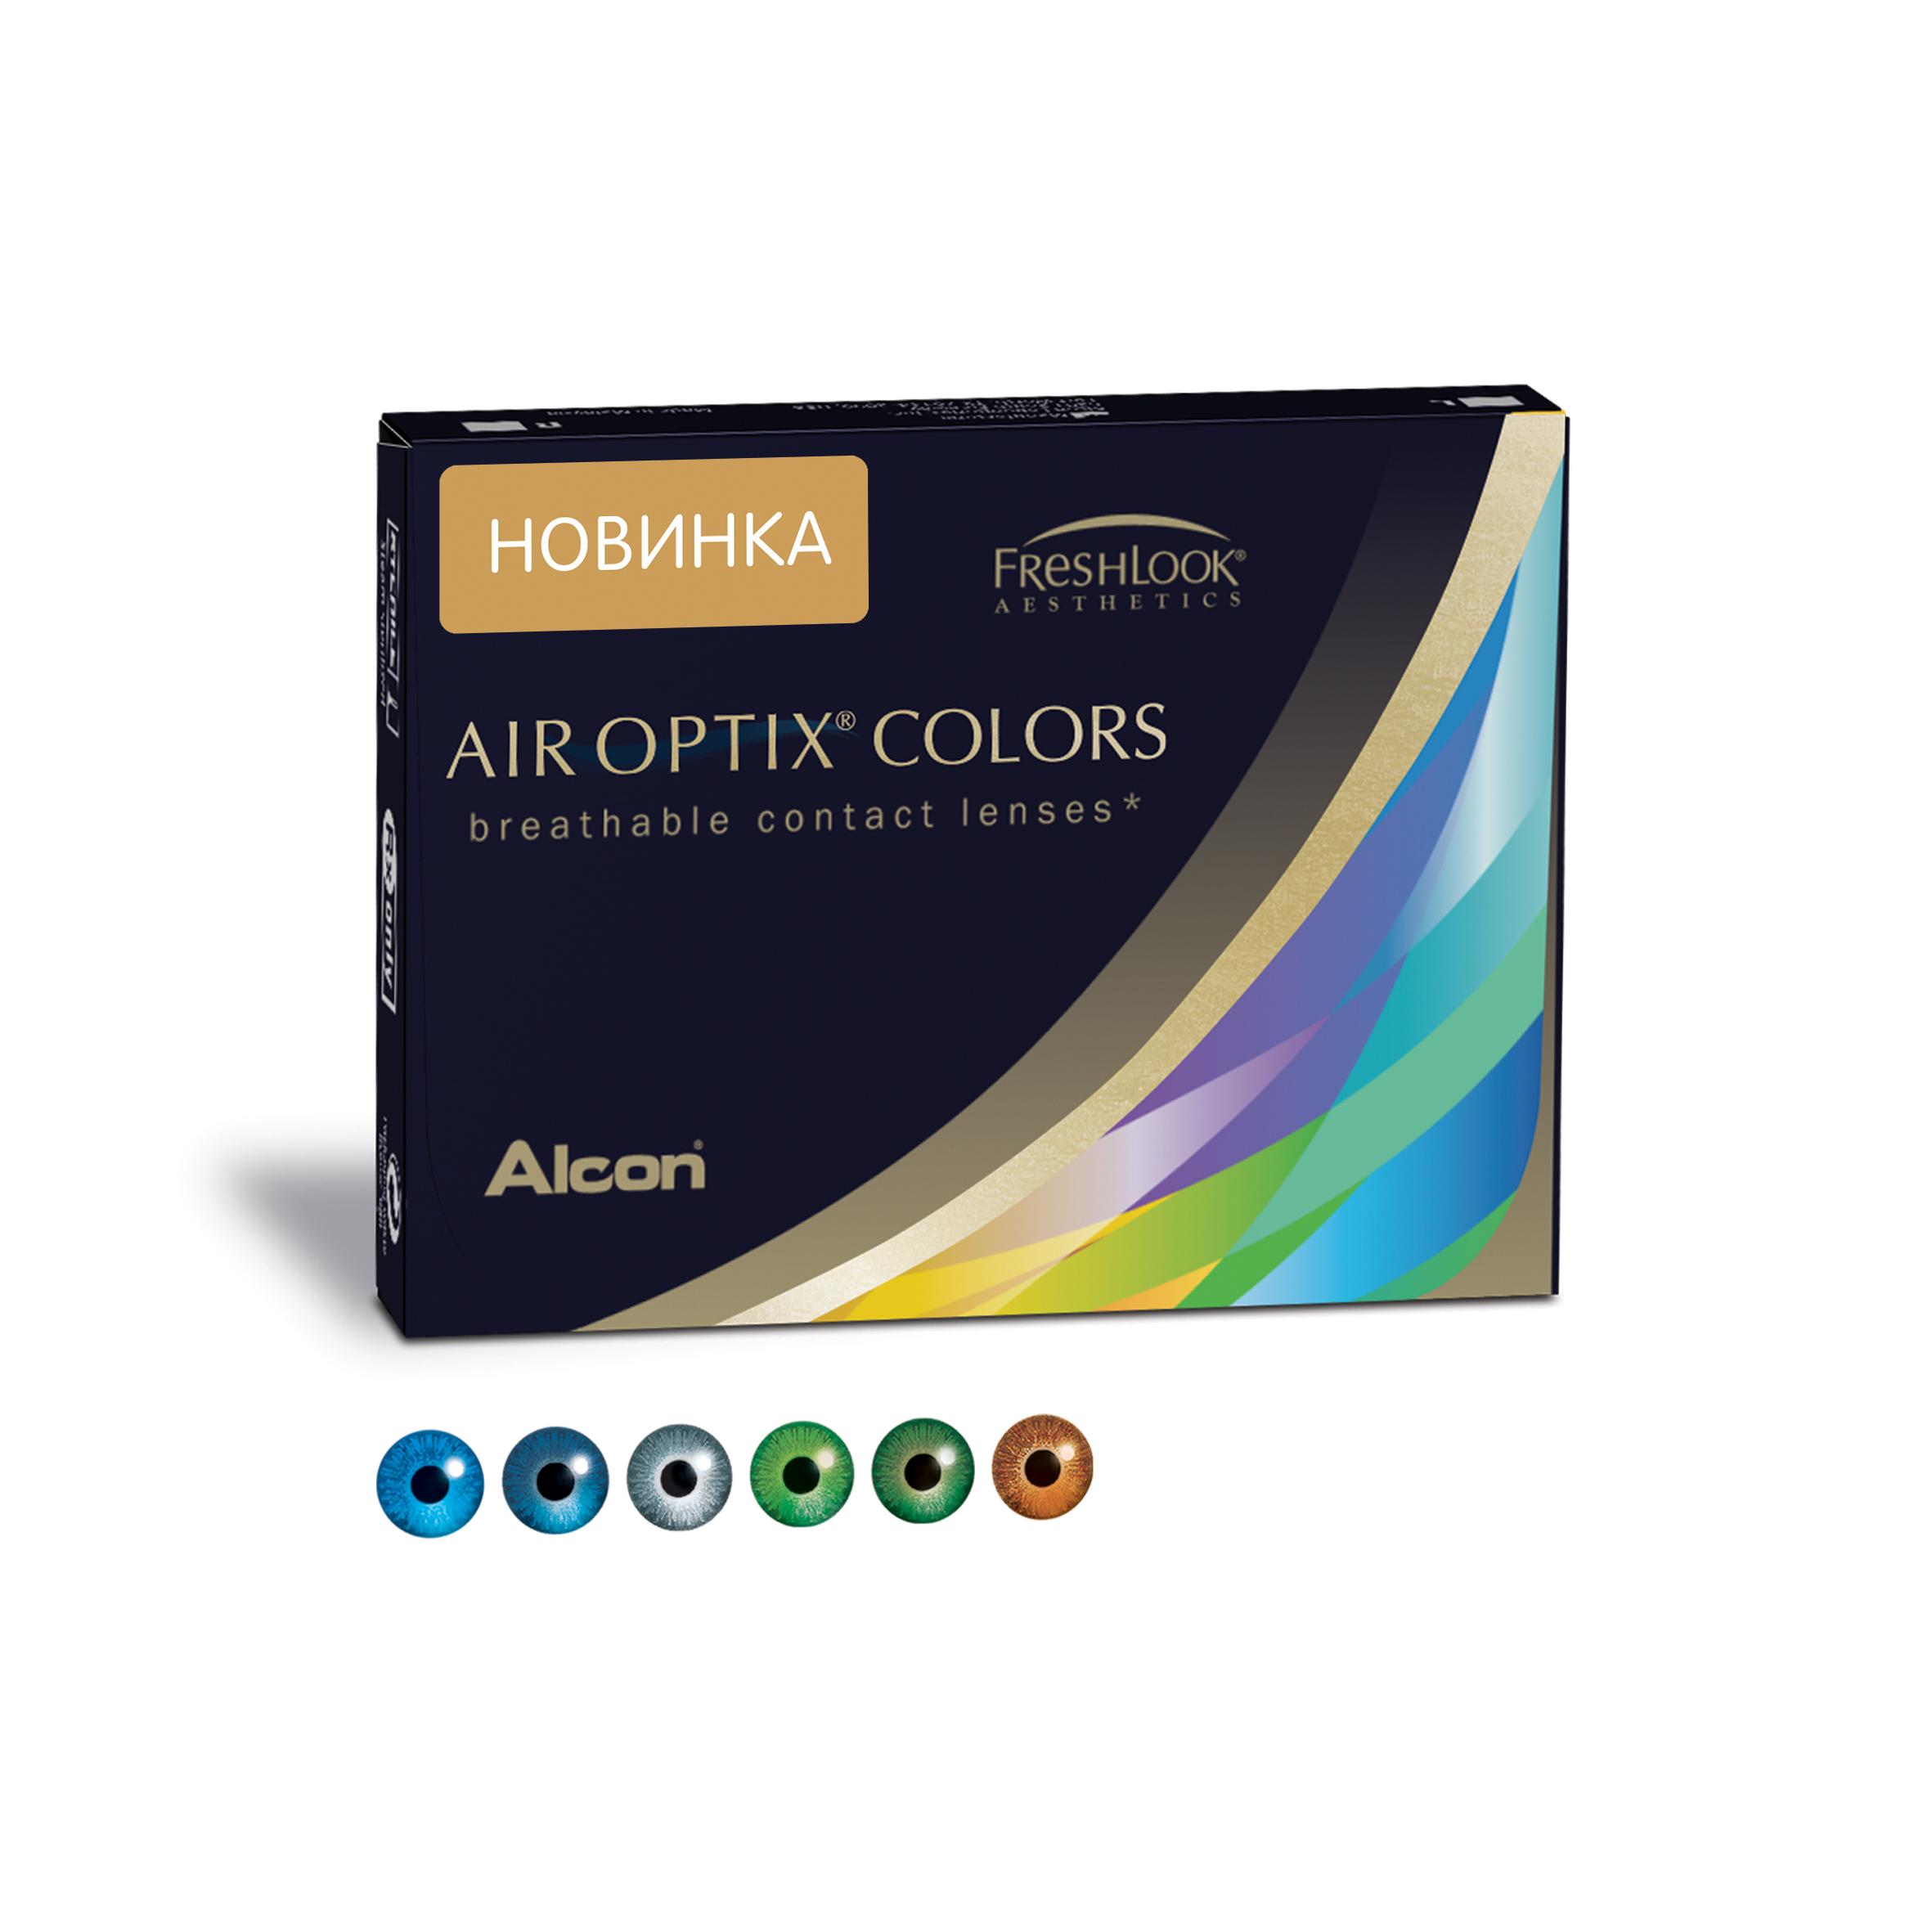 Аlcon контактные линзы Air Optix Colors 2 шт -6.50 Honey31746316Мягкие контактные линзы